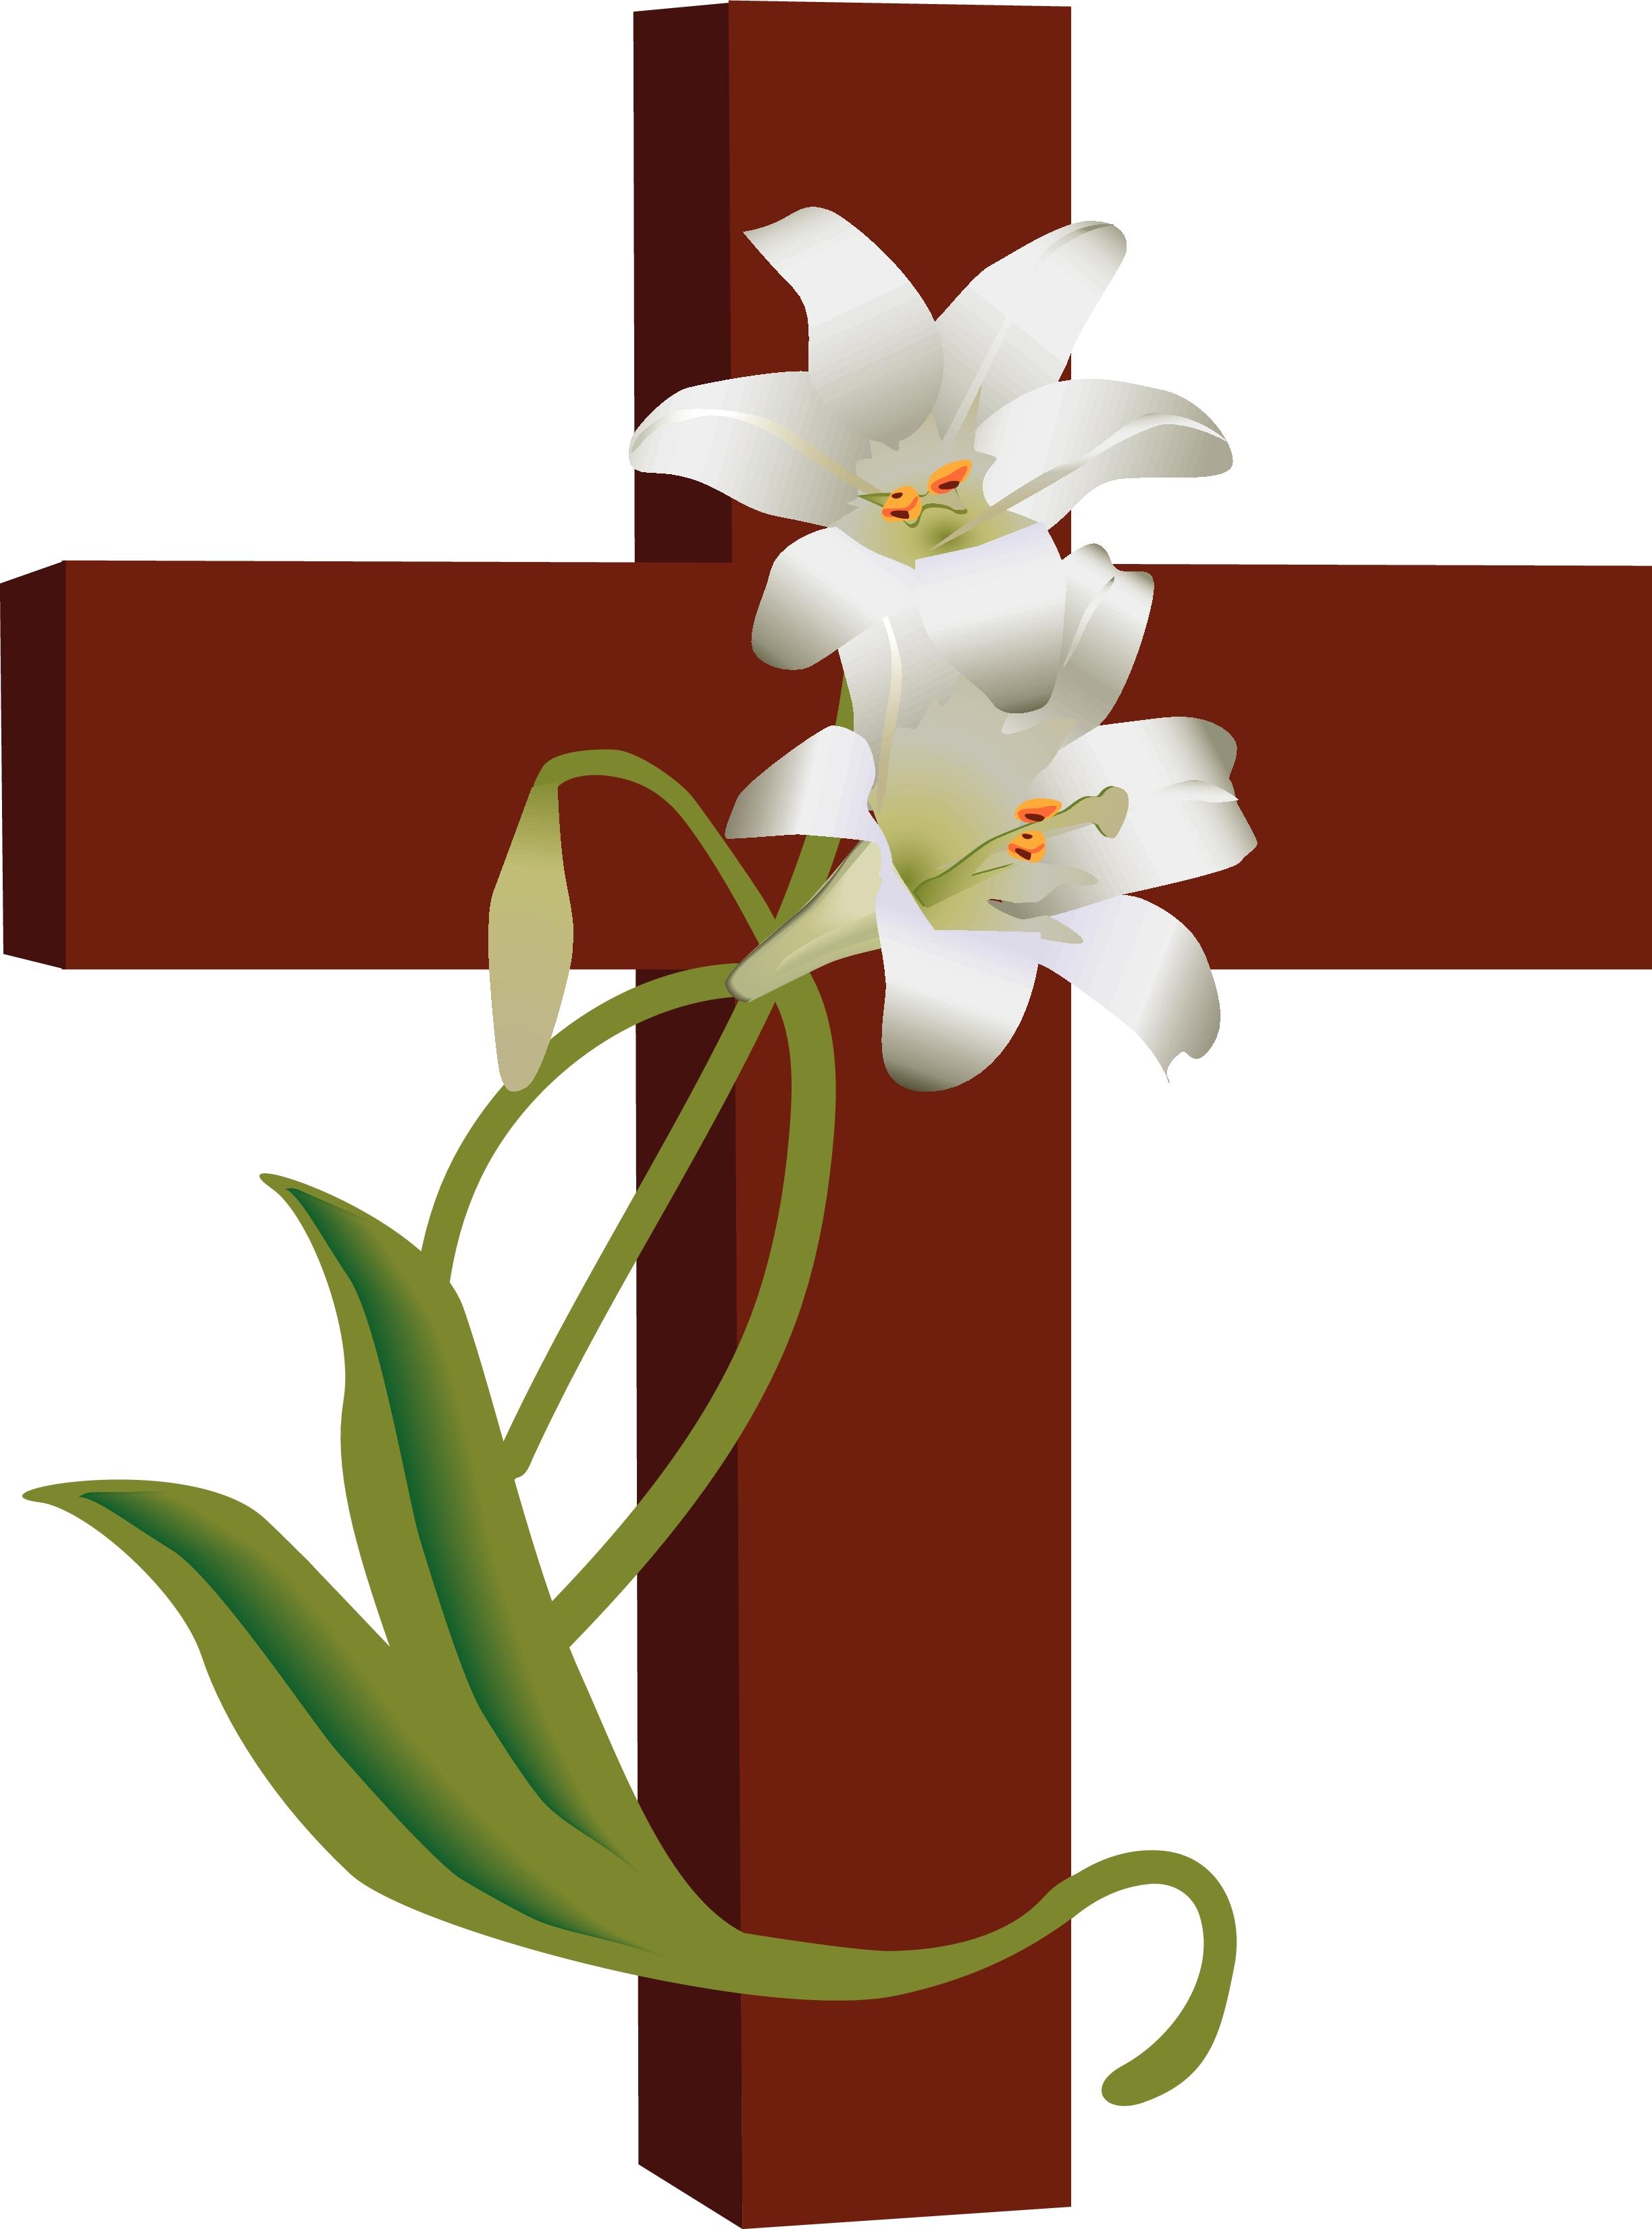 Christian Burial Symbols Clipart.